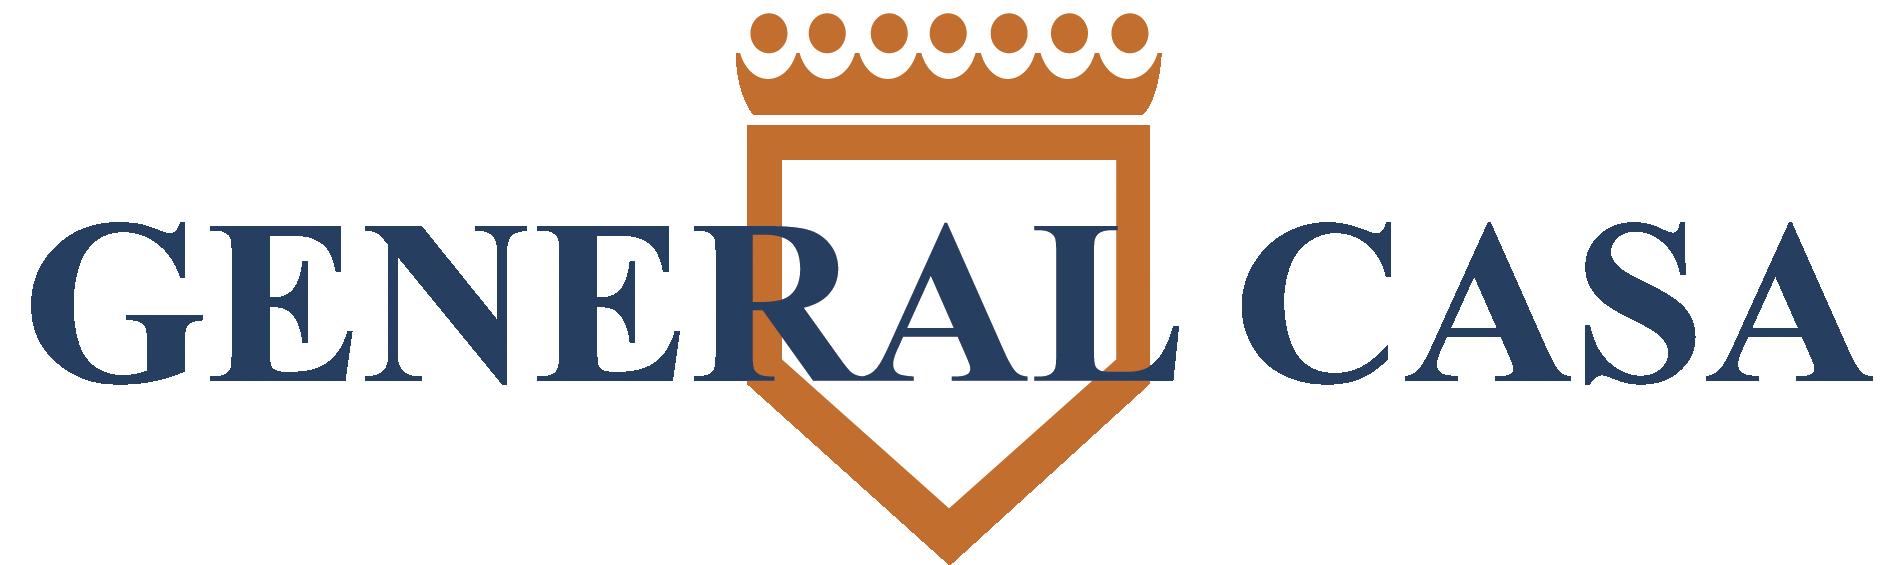 logo GENERAL CASA